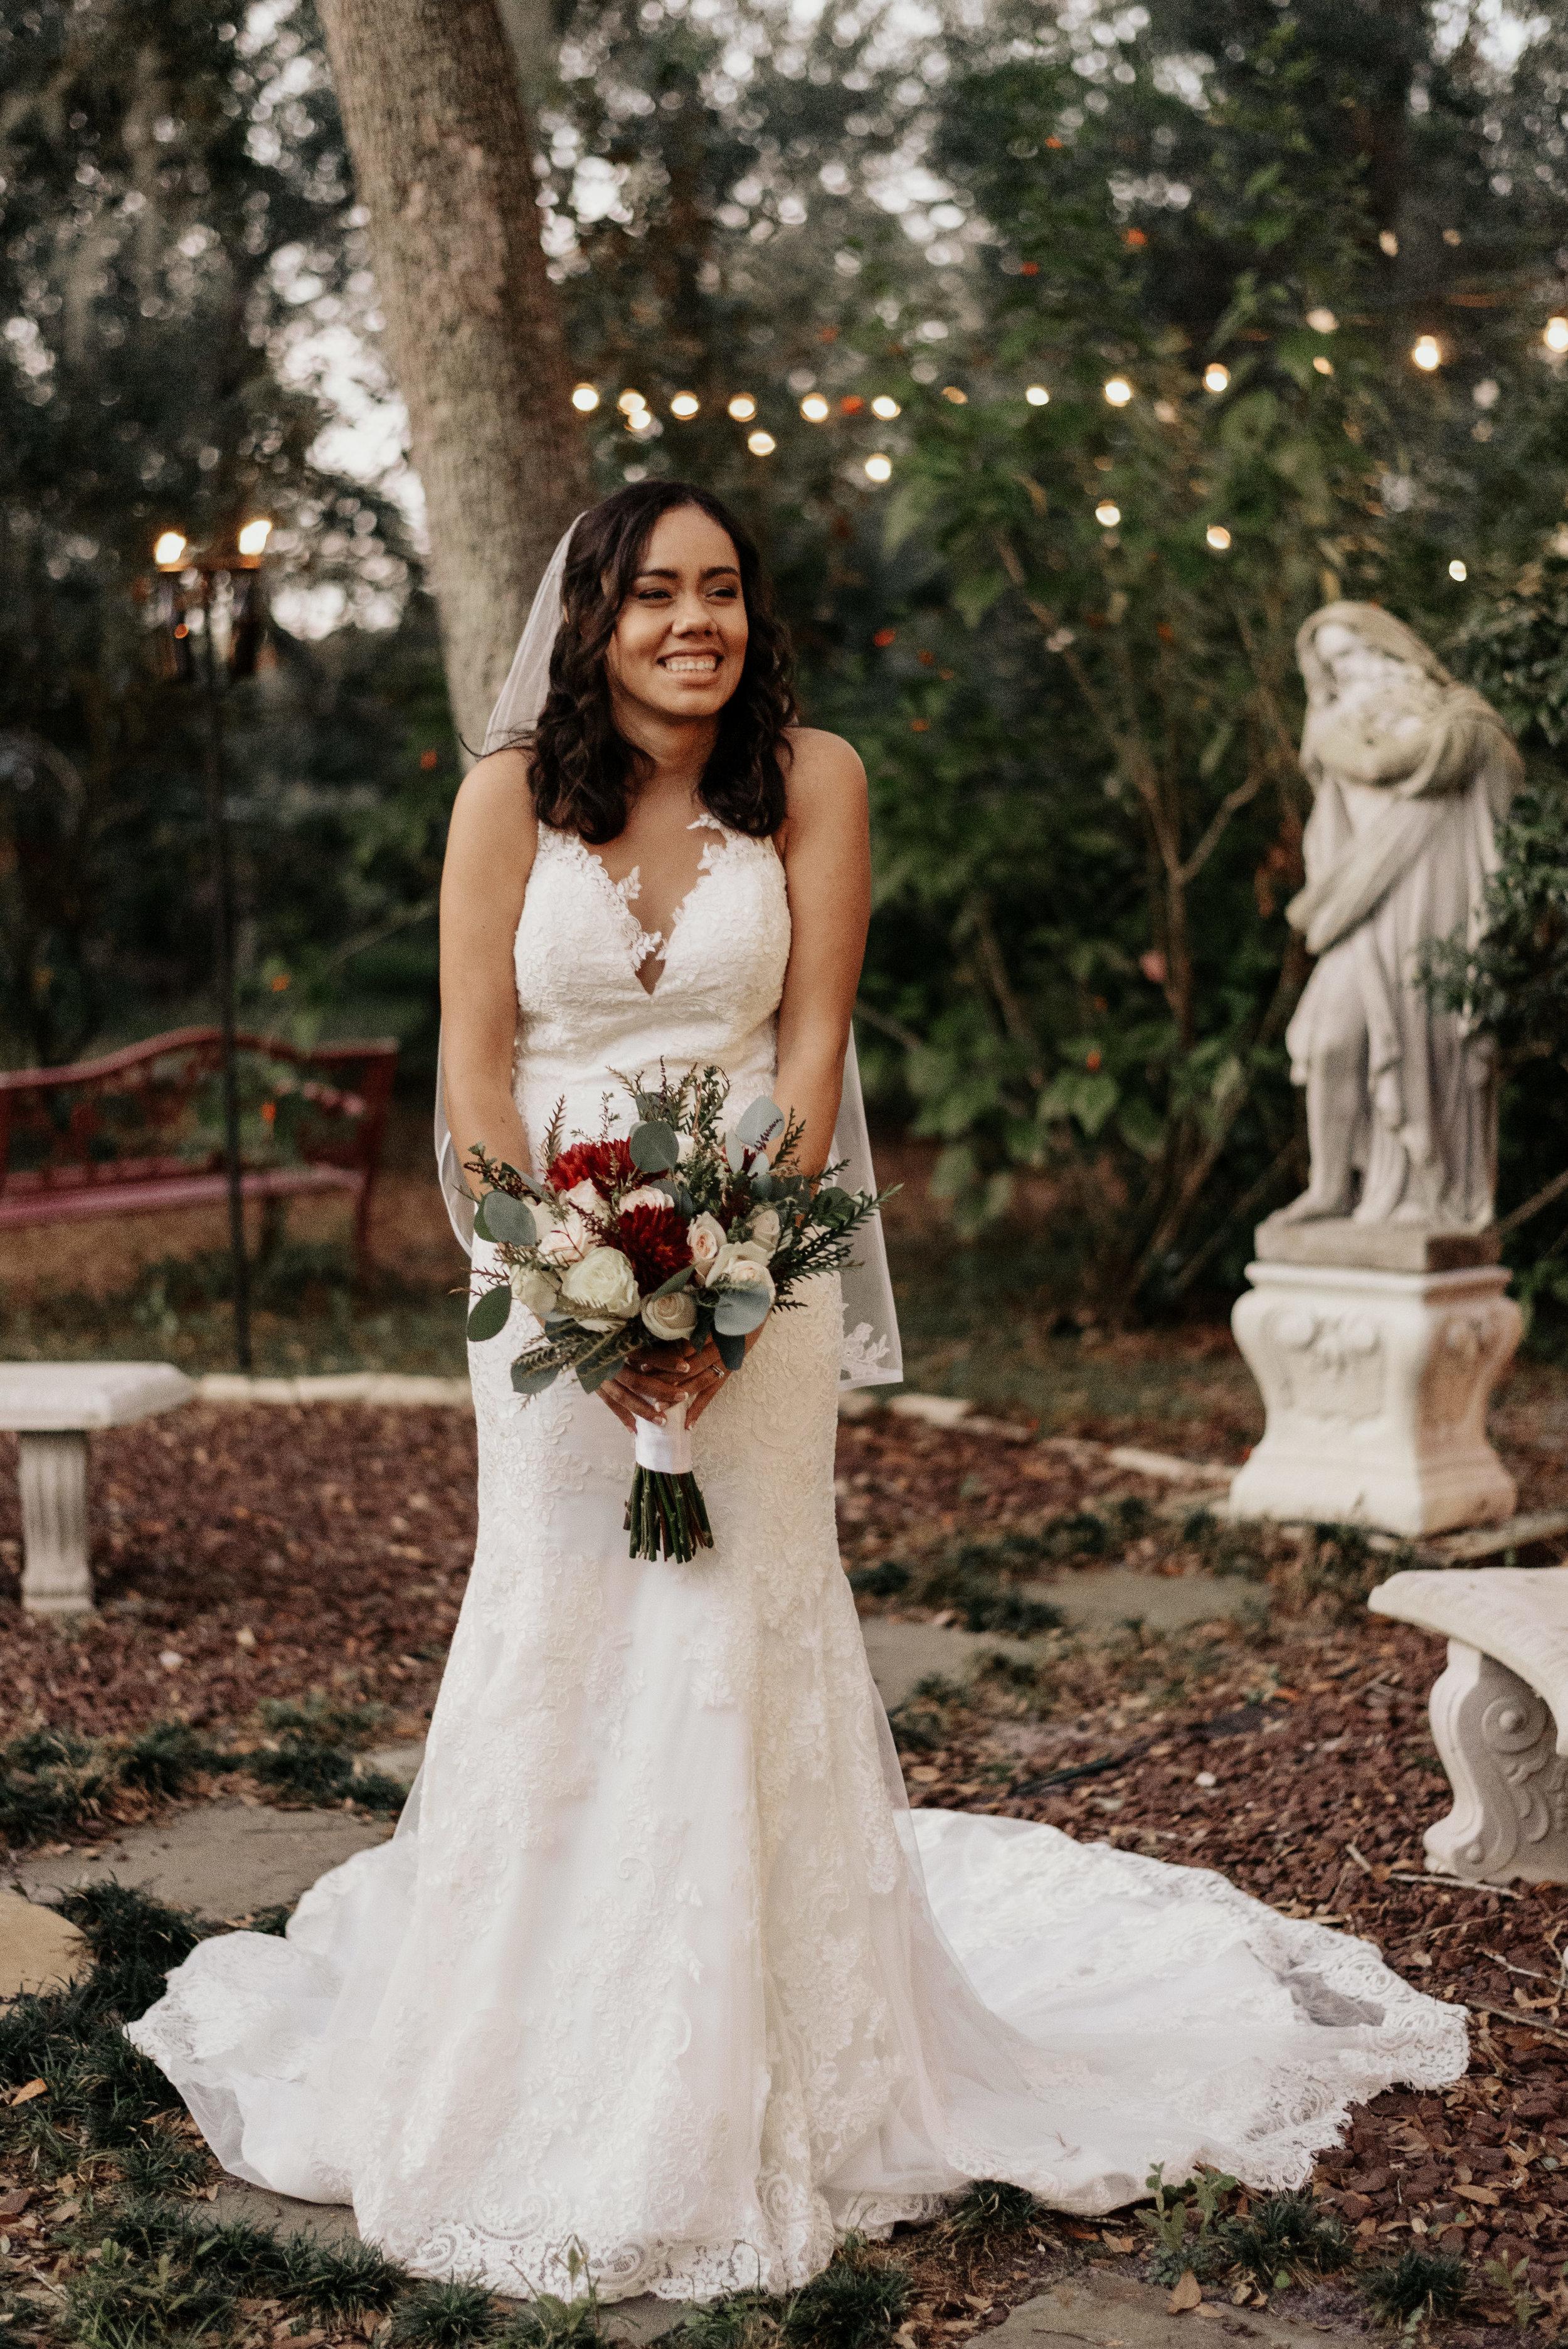 Kirstie-AJ-Wedding-9119.jpg